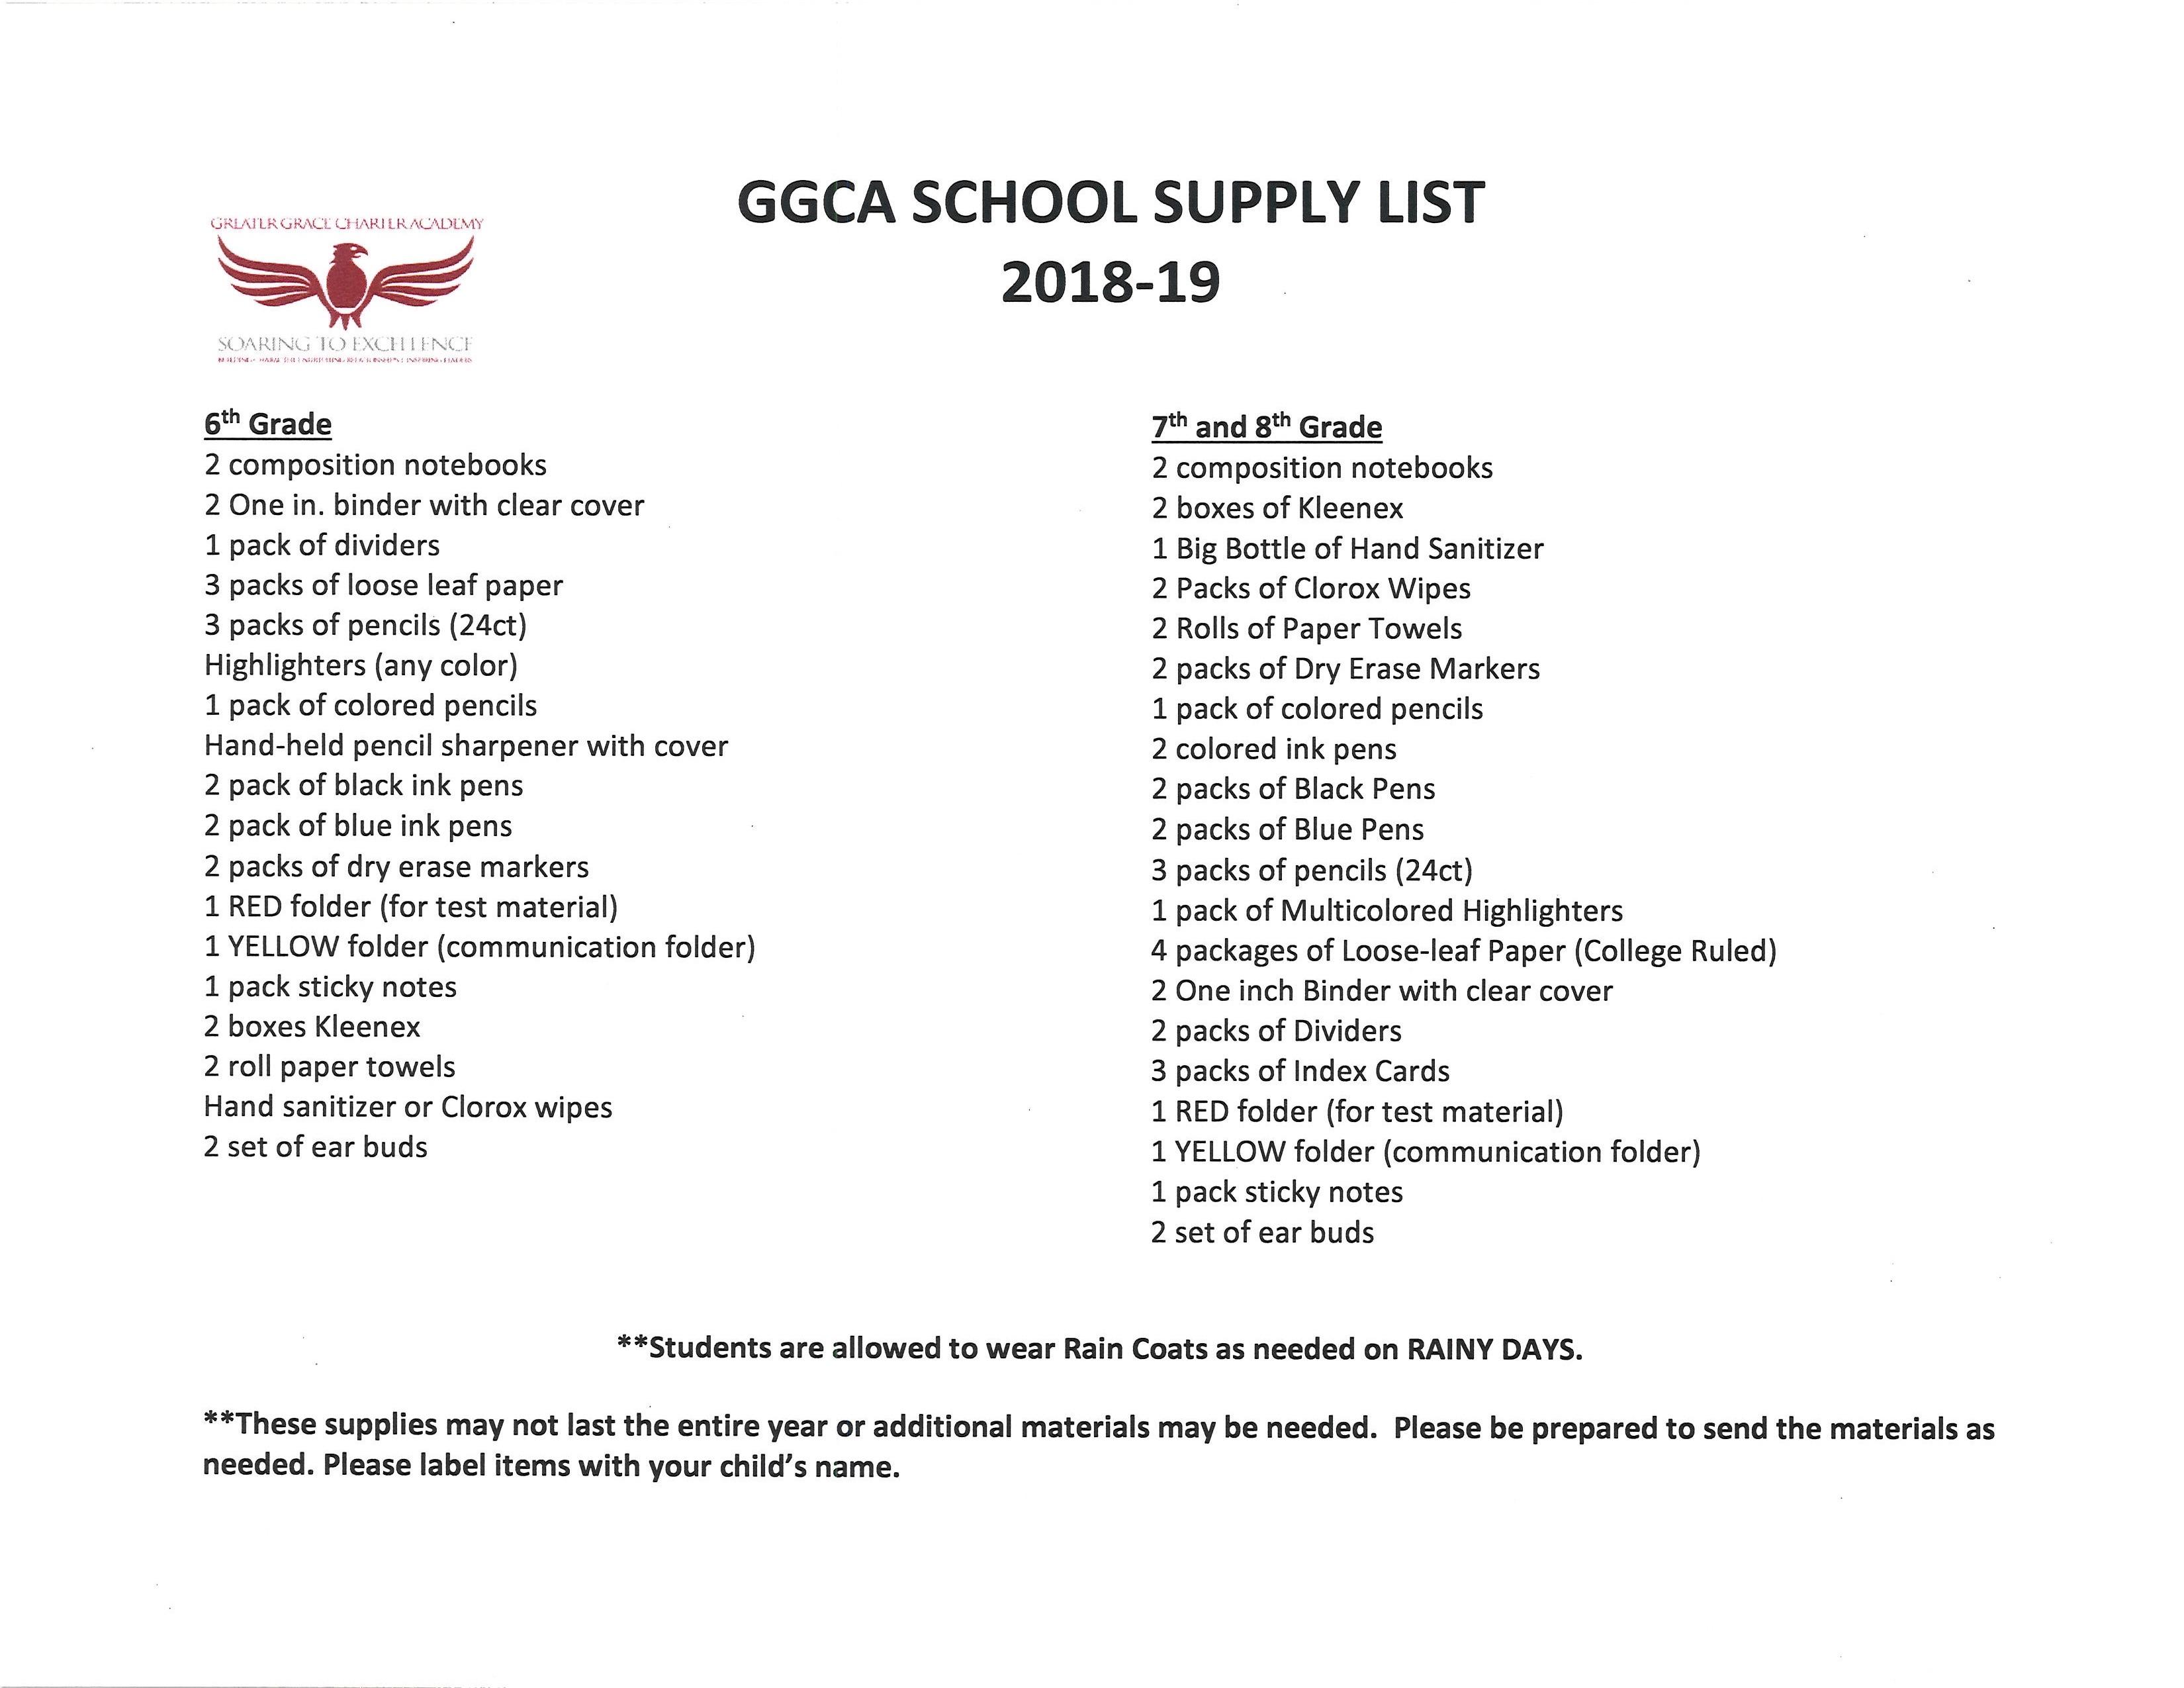 2017 2018 School Supply List Greater Grace Charter Academy